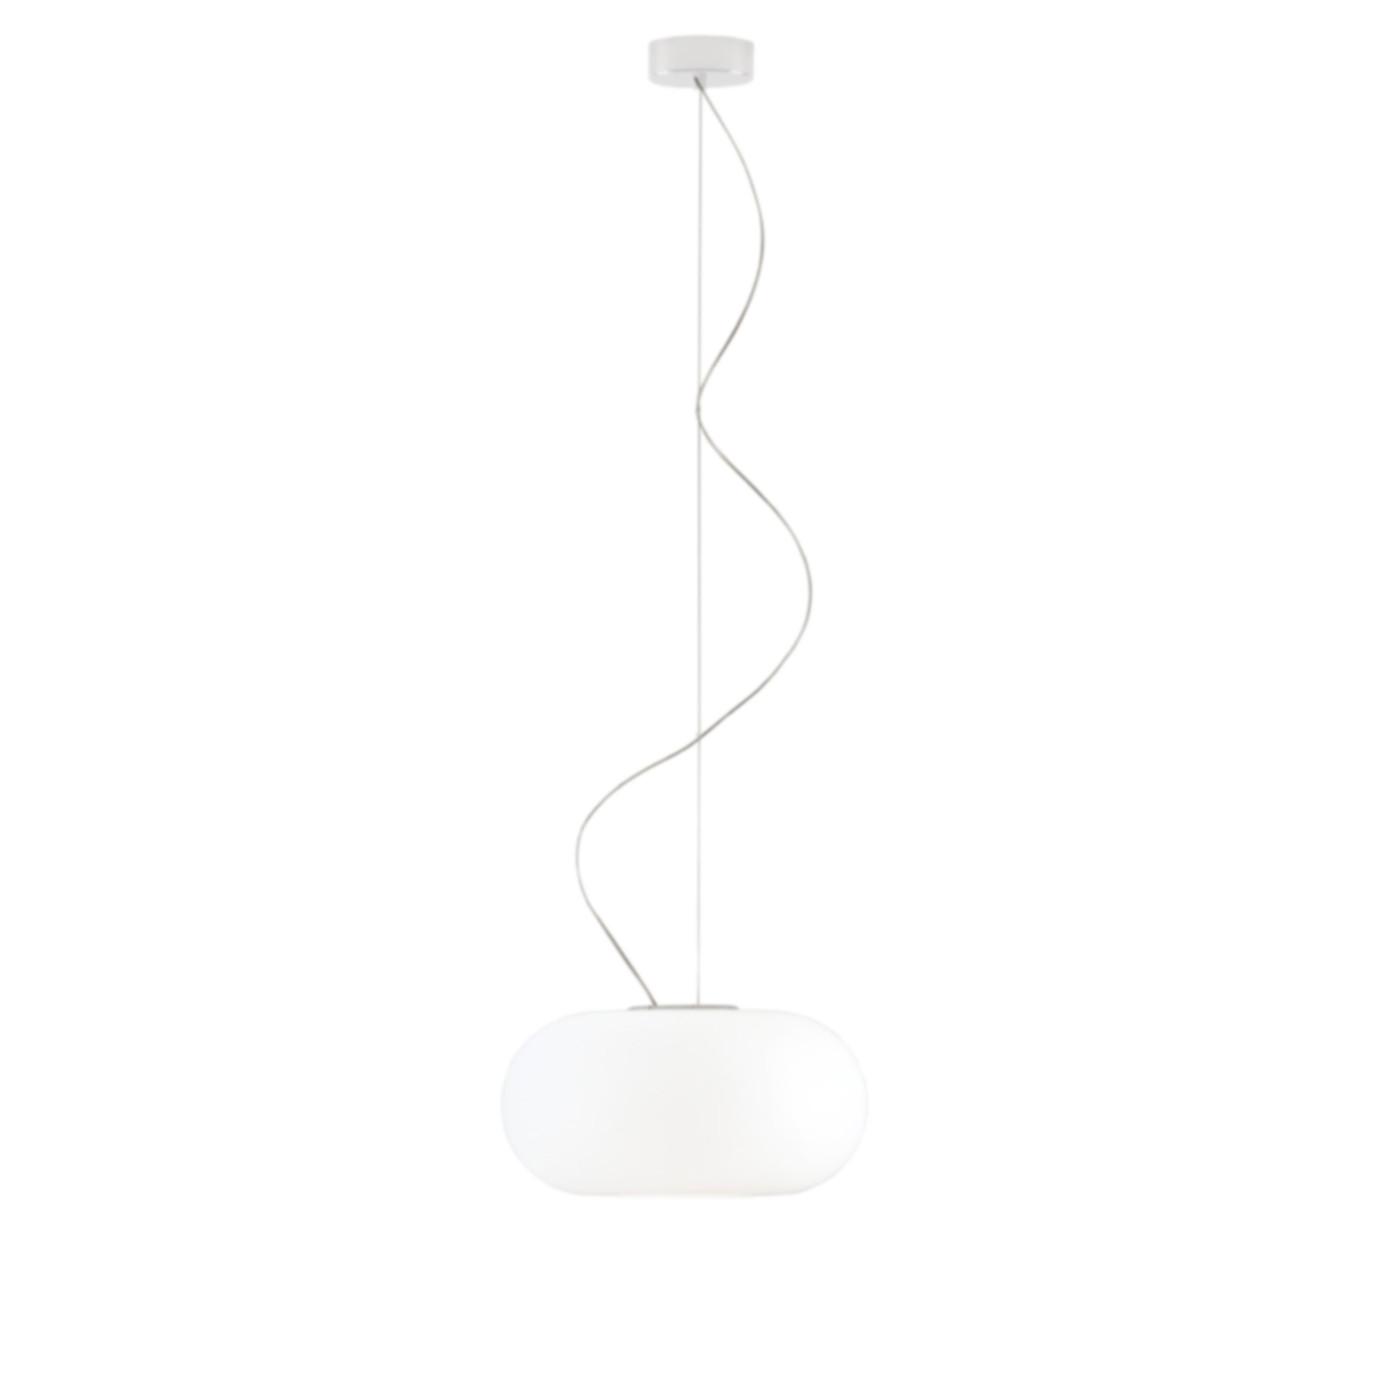 Prandina Over LED S3 / S5